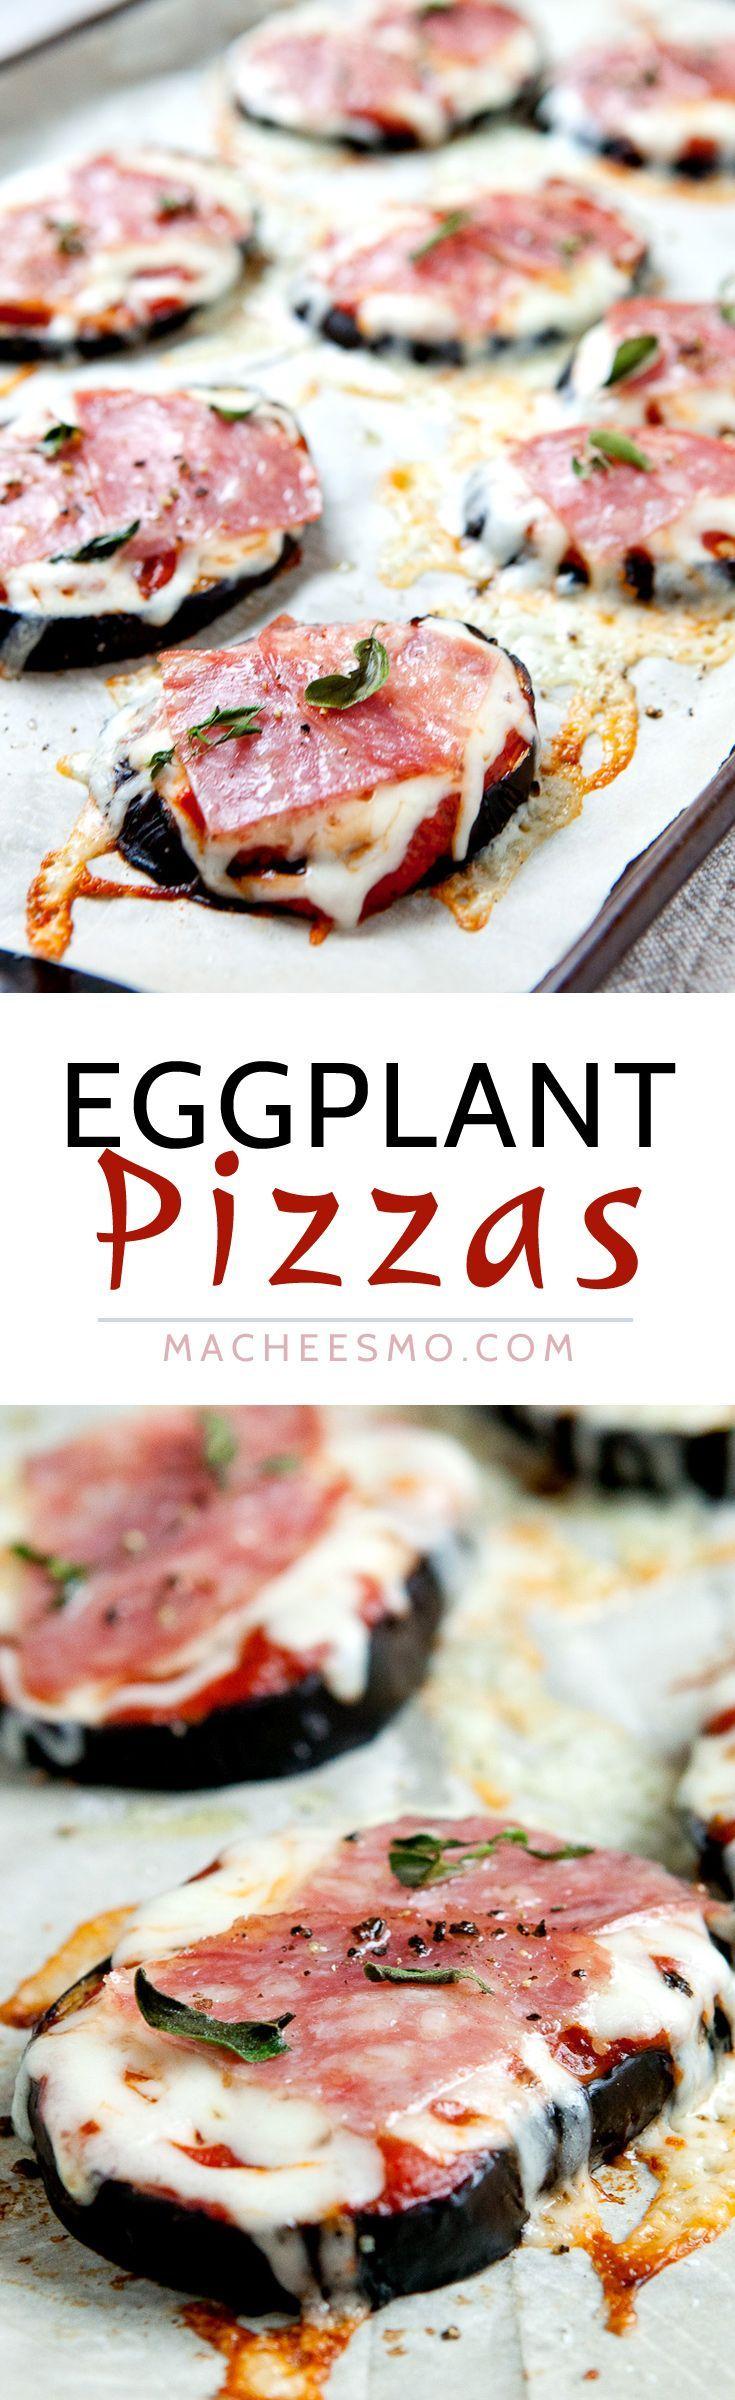 easy pepperoni eggplant pizzas  recipe  eggplant pizzas